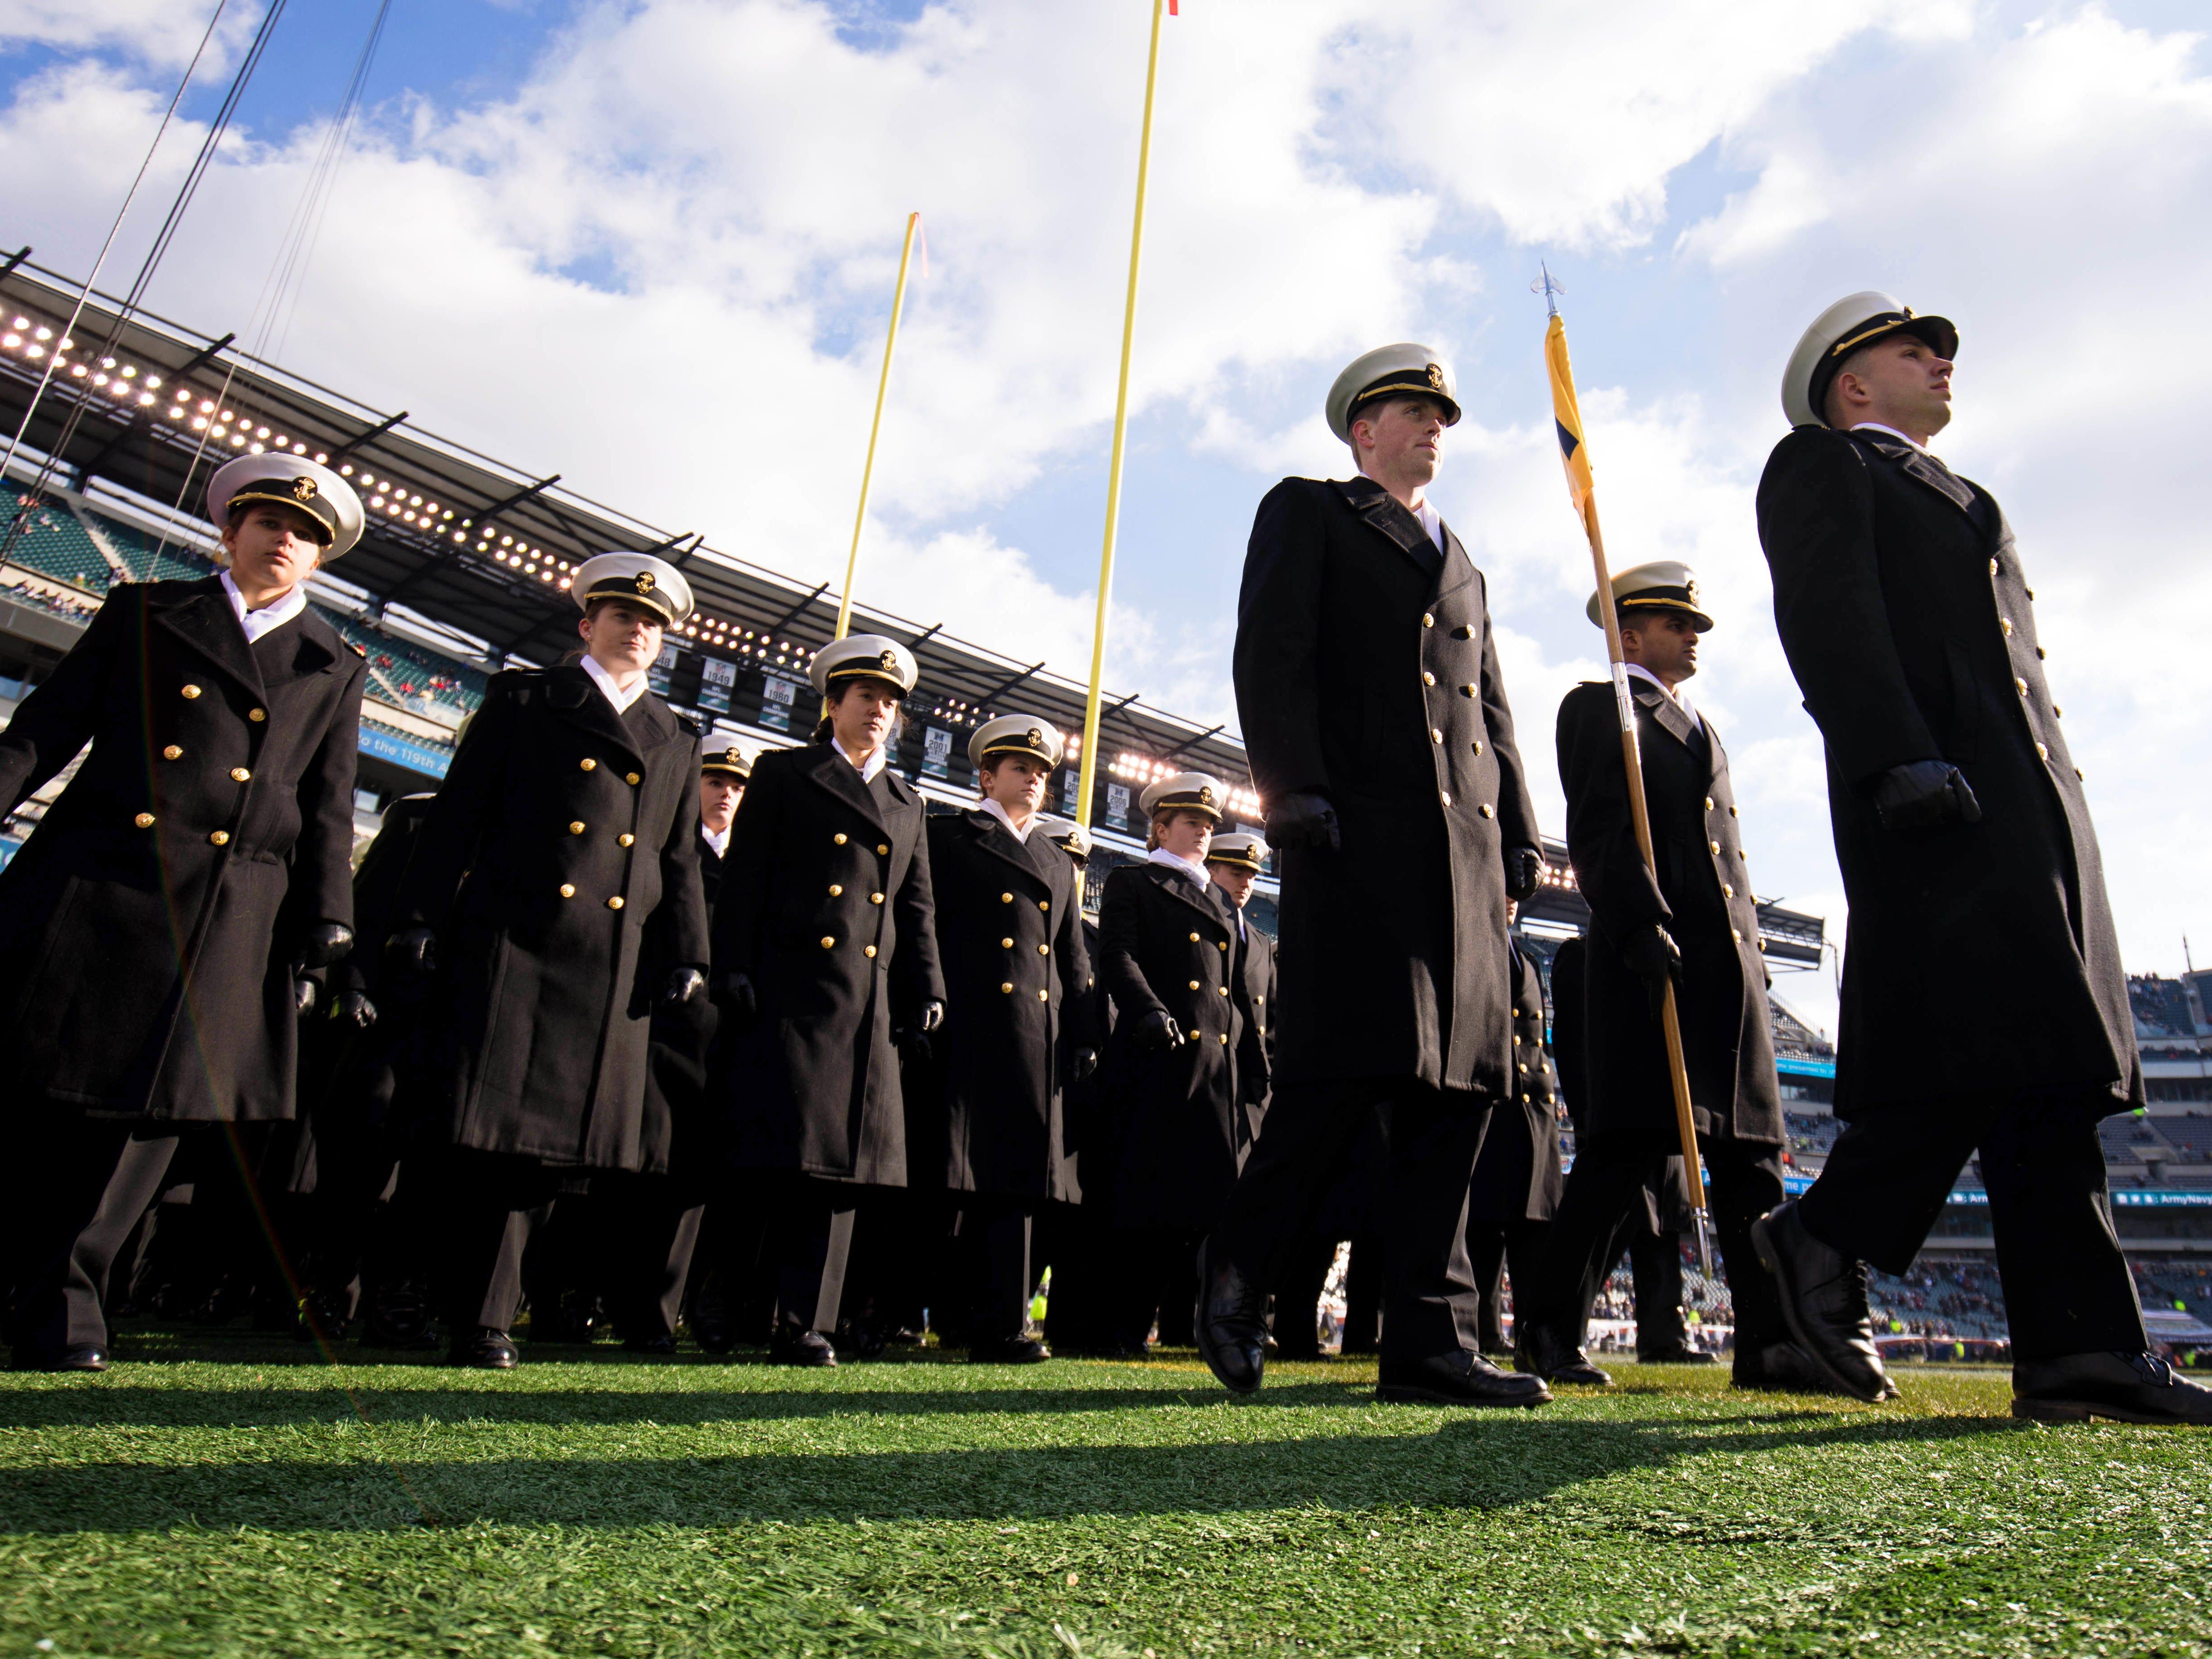 Navy Midshipmen march on the field.